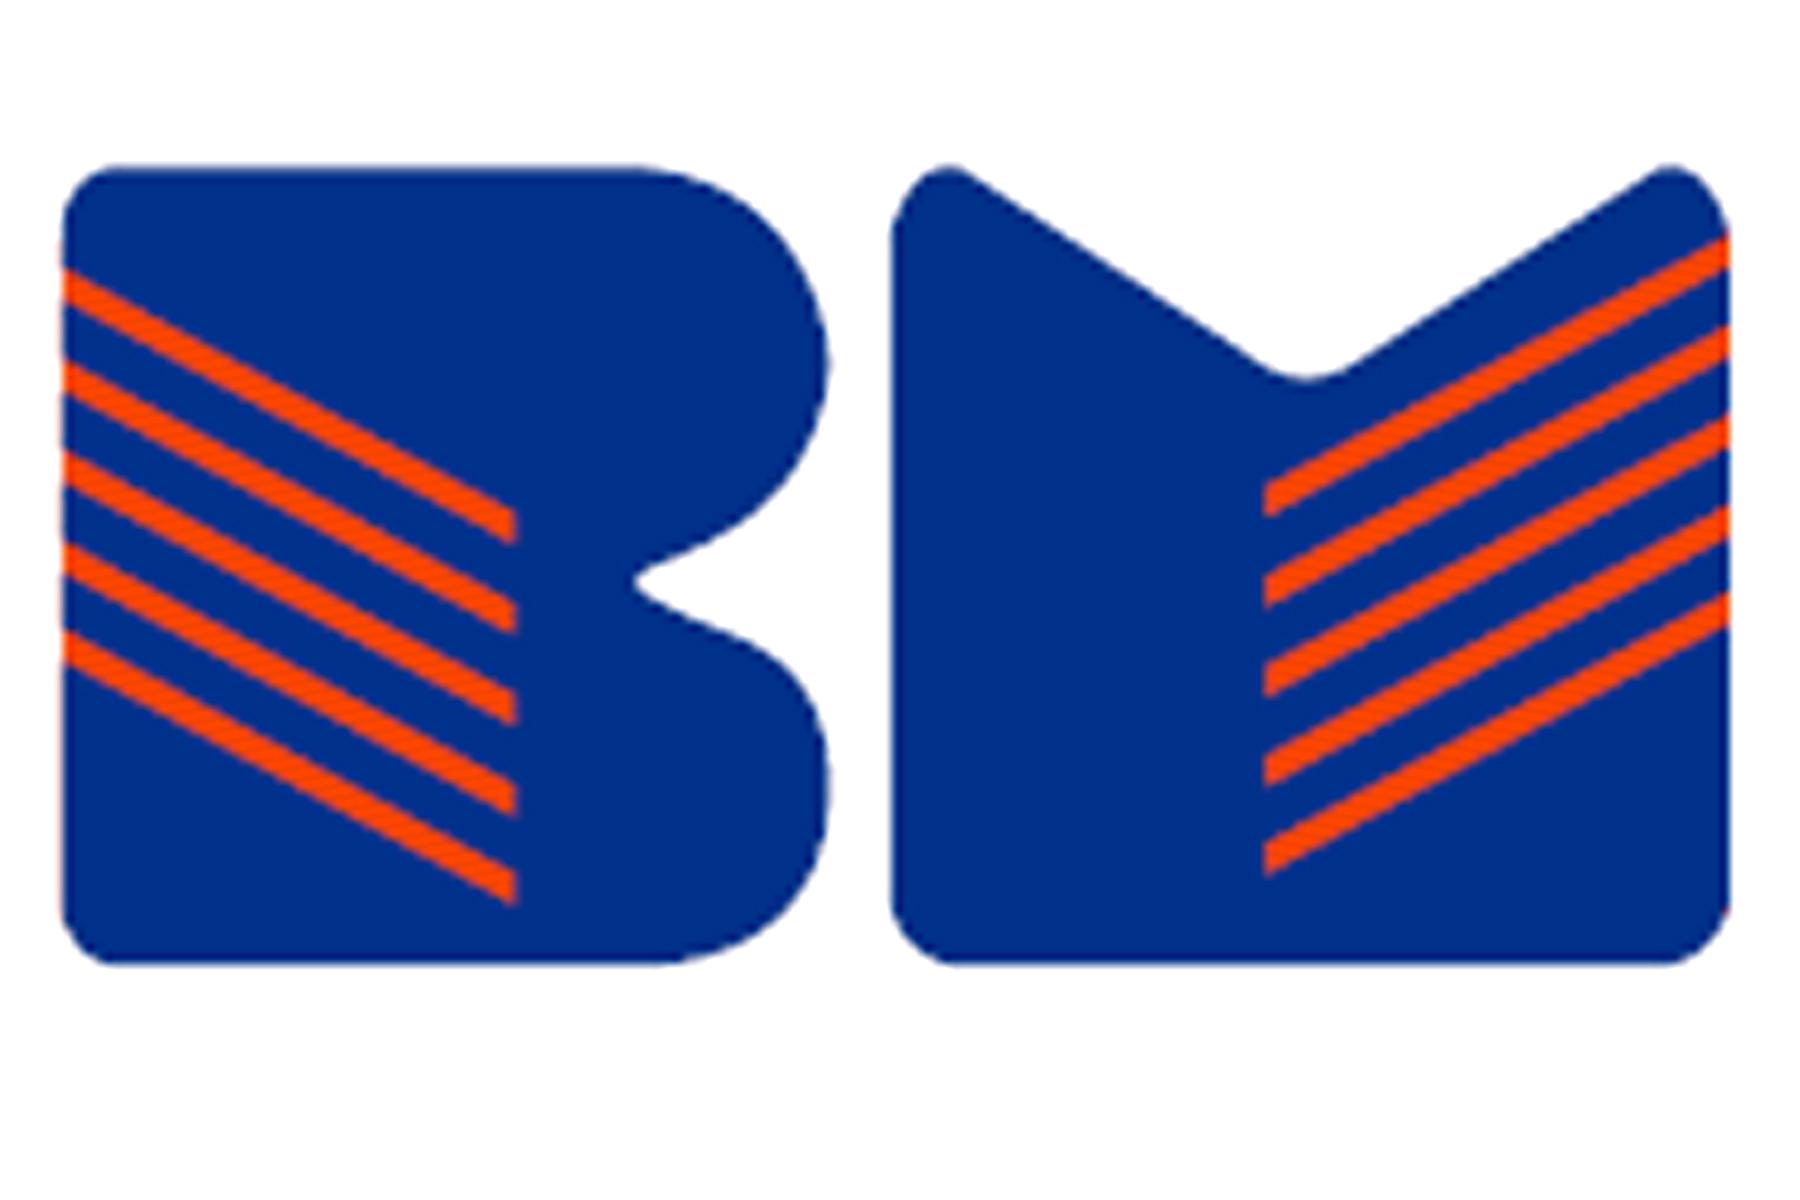 Bajaj Processpack Ltd